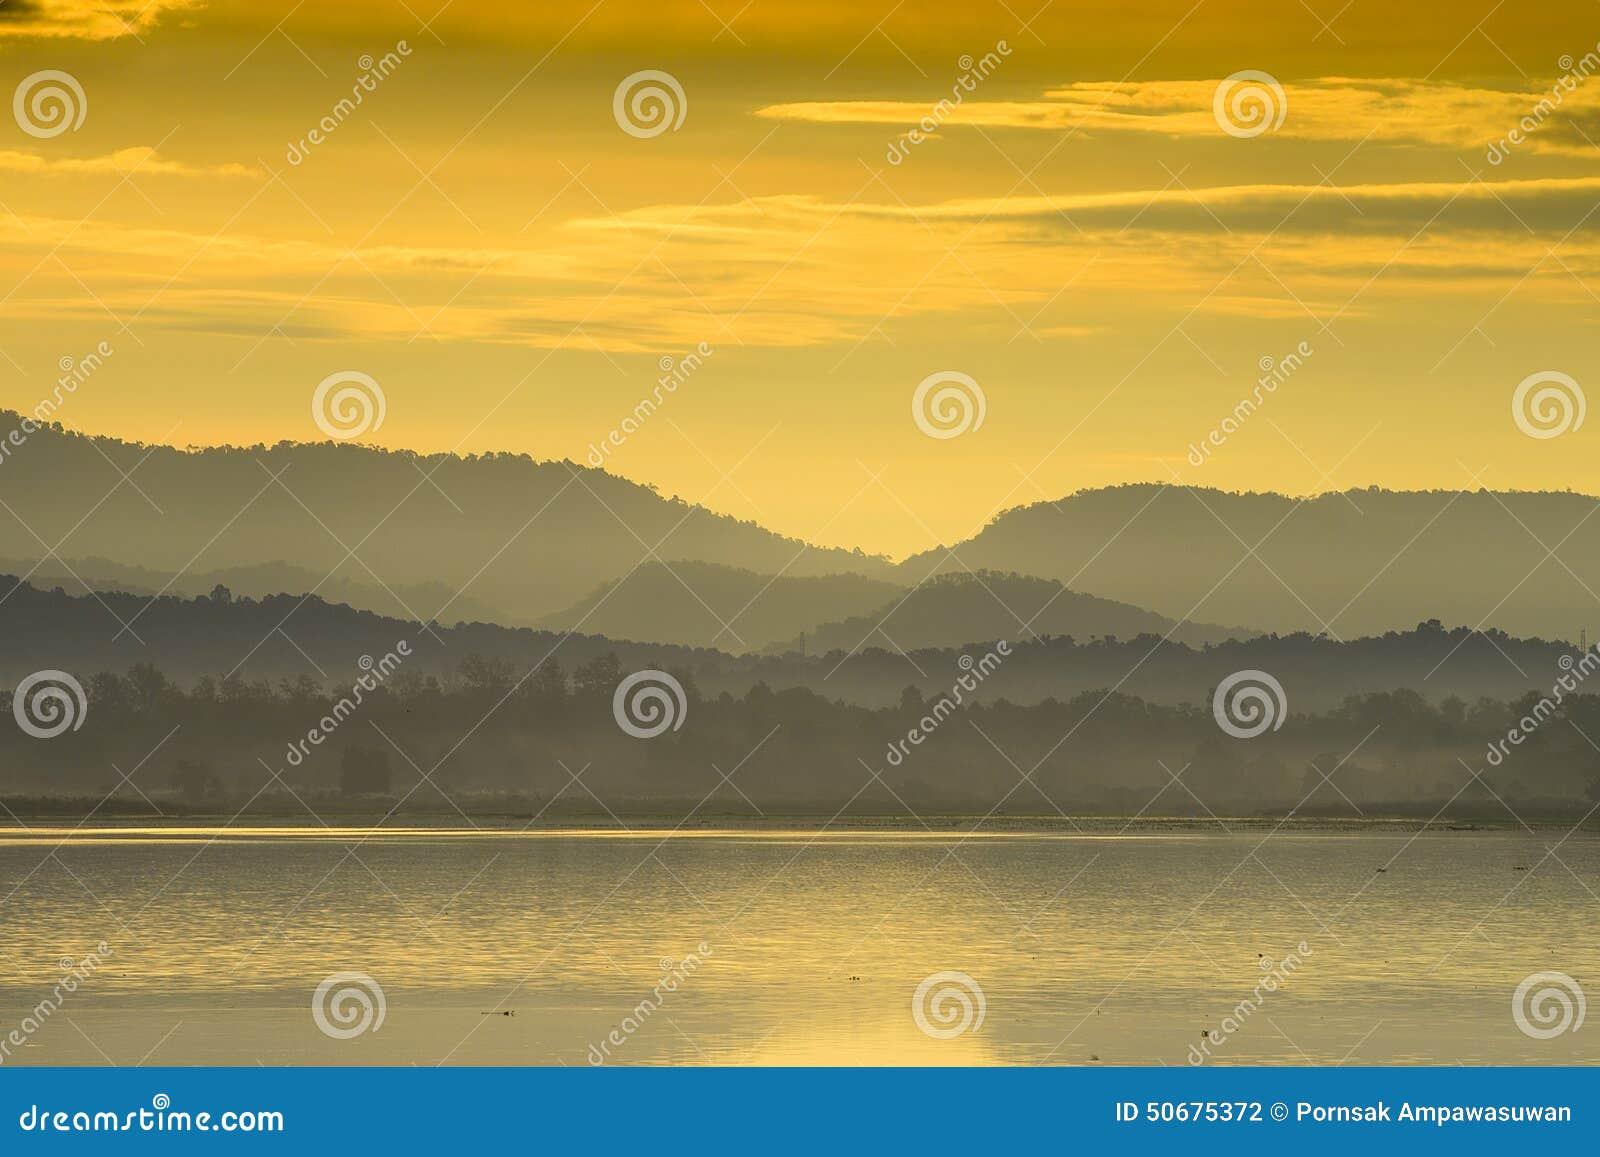 Download 山泰国视图 库存照片. 图片 包括有 夏天, 横向, 日落, 日出, 早晨, 云彩, 公园, beautifuler - 50675372